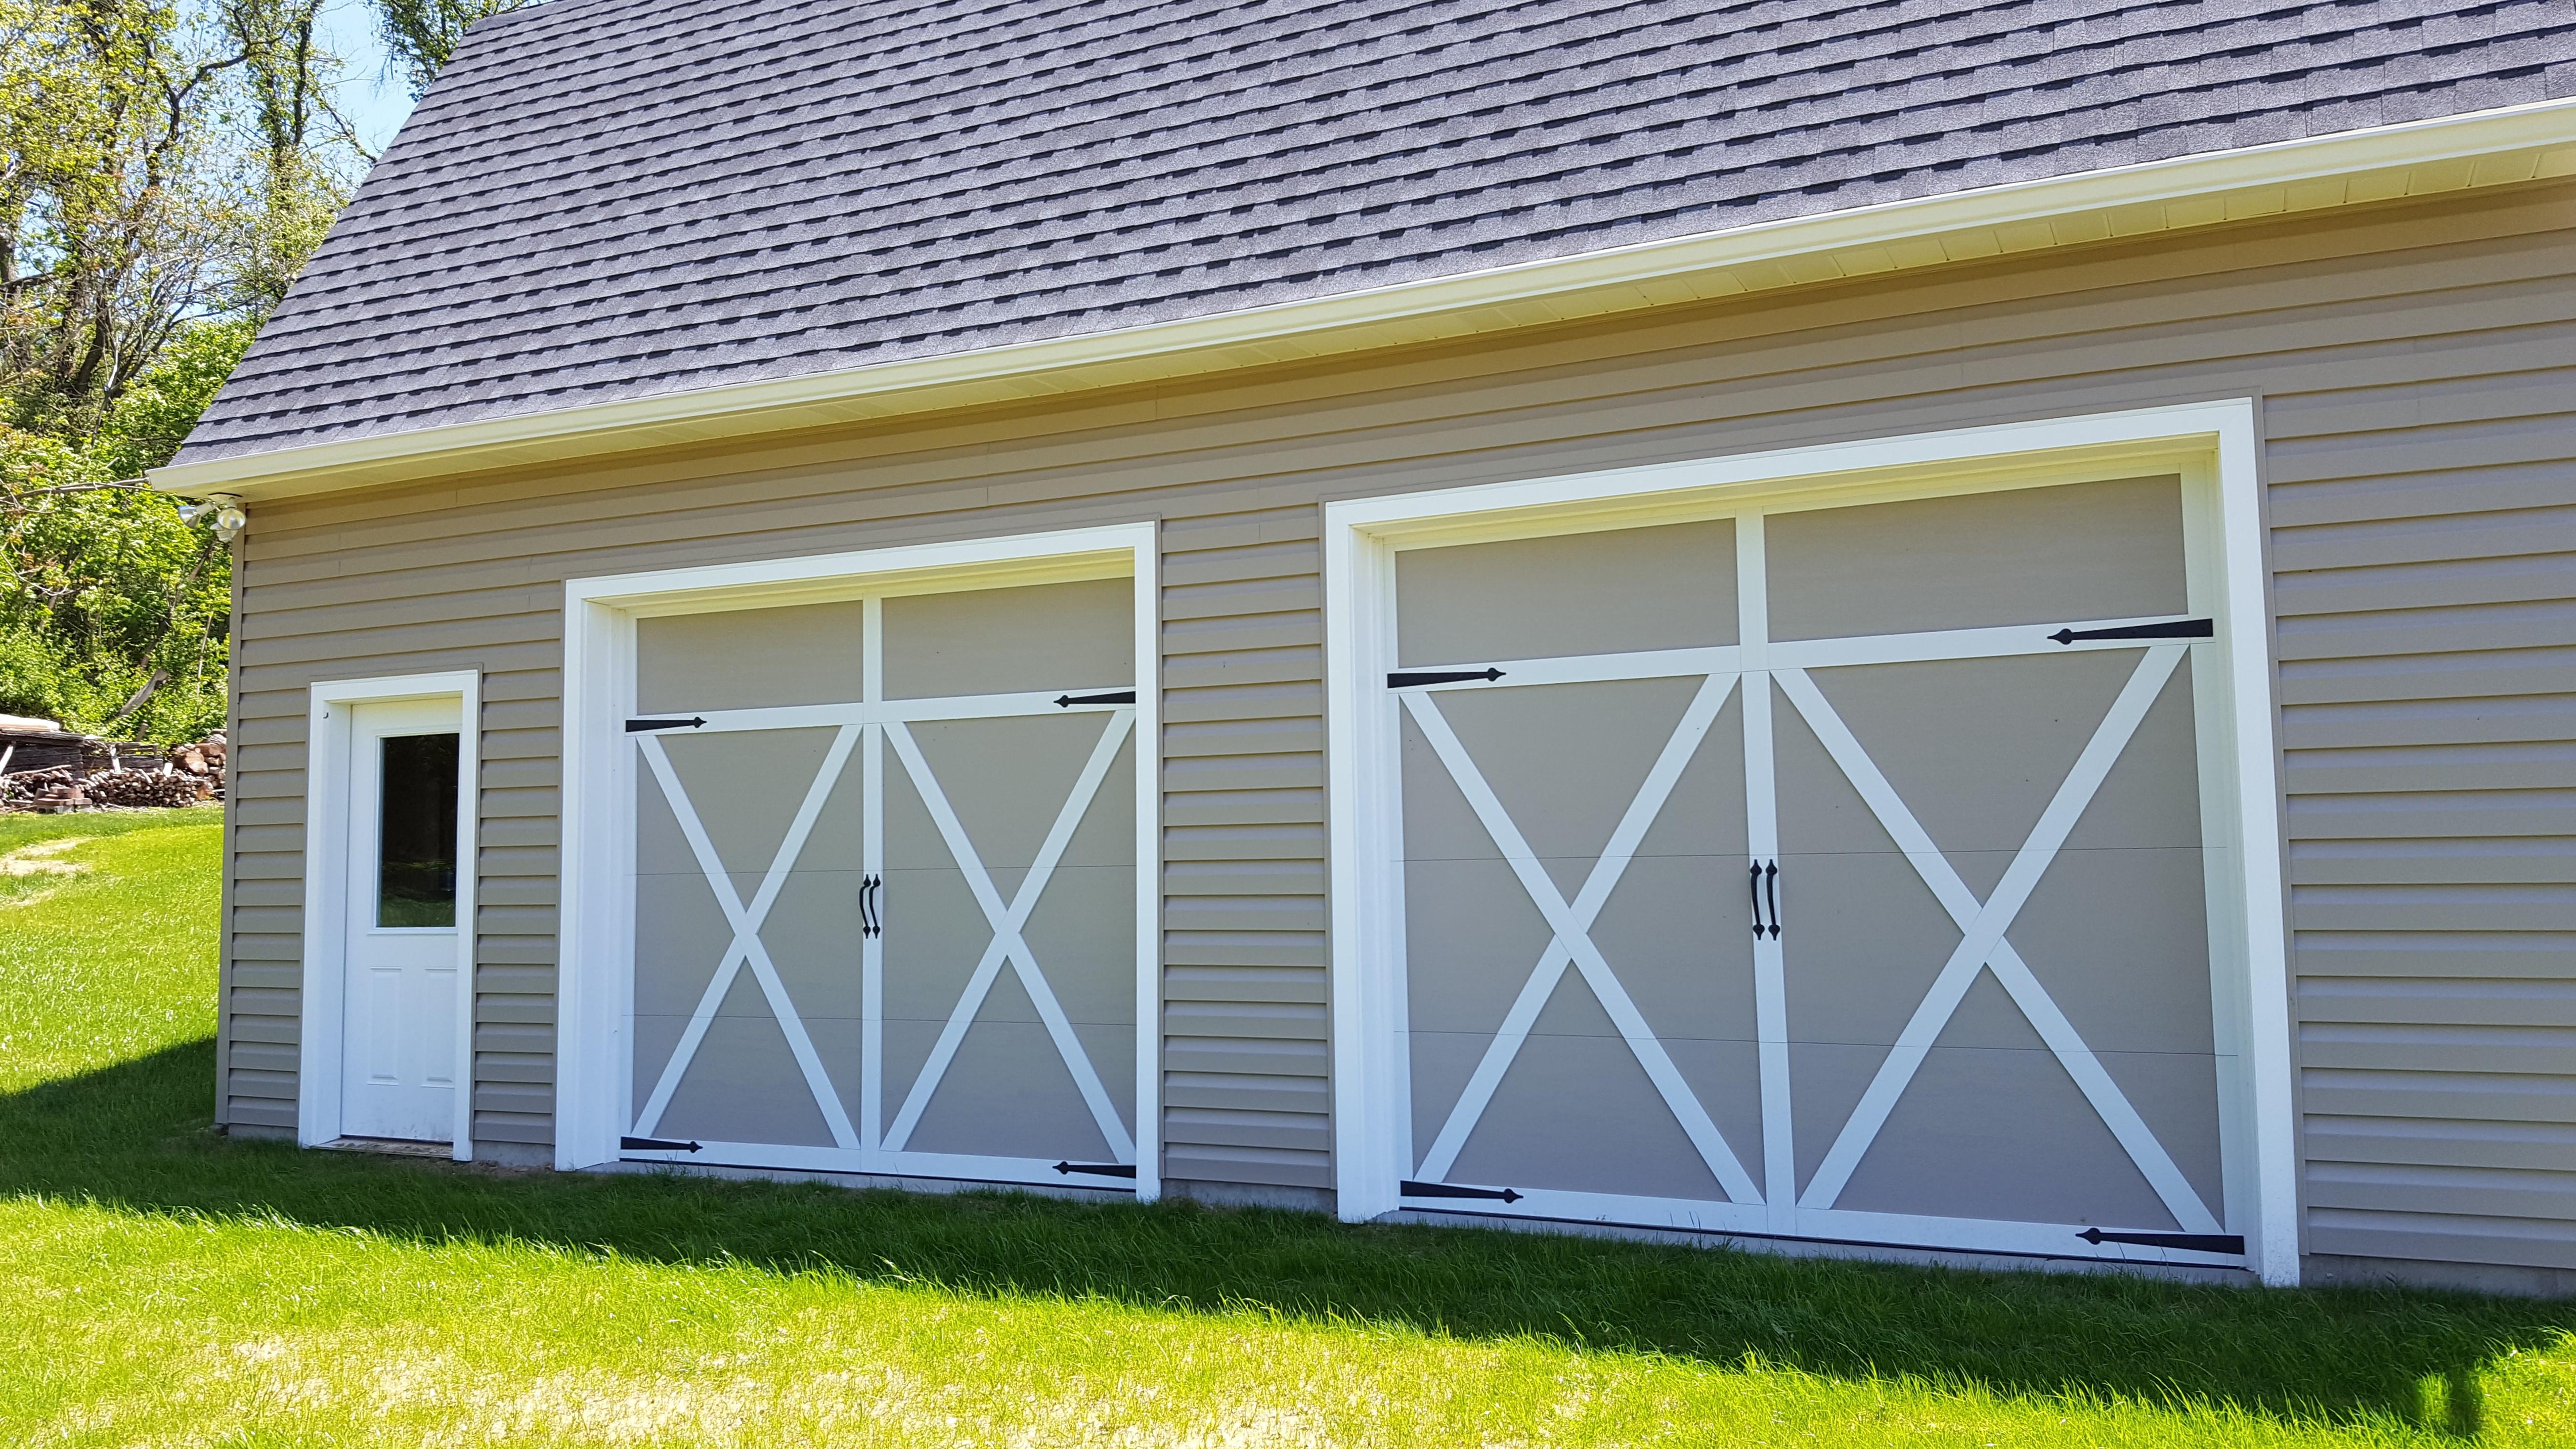 El's Door Sales - Serving Lampeter PA and Surrounding Areas